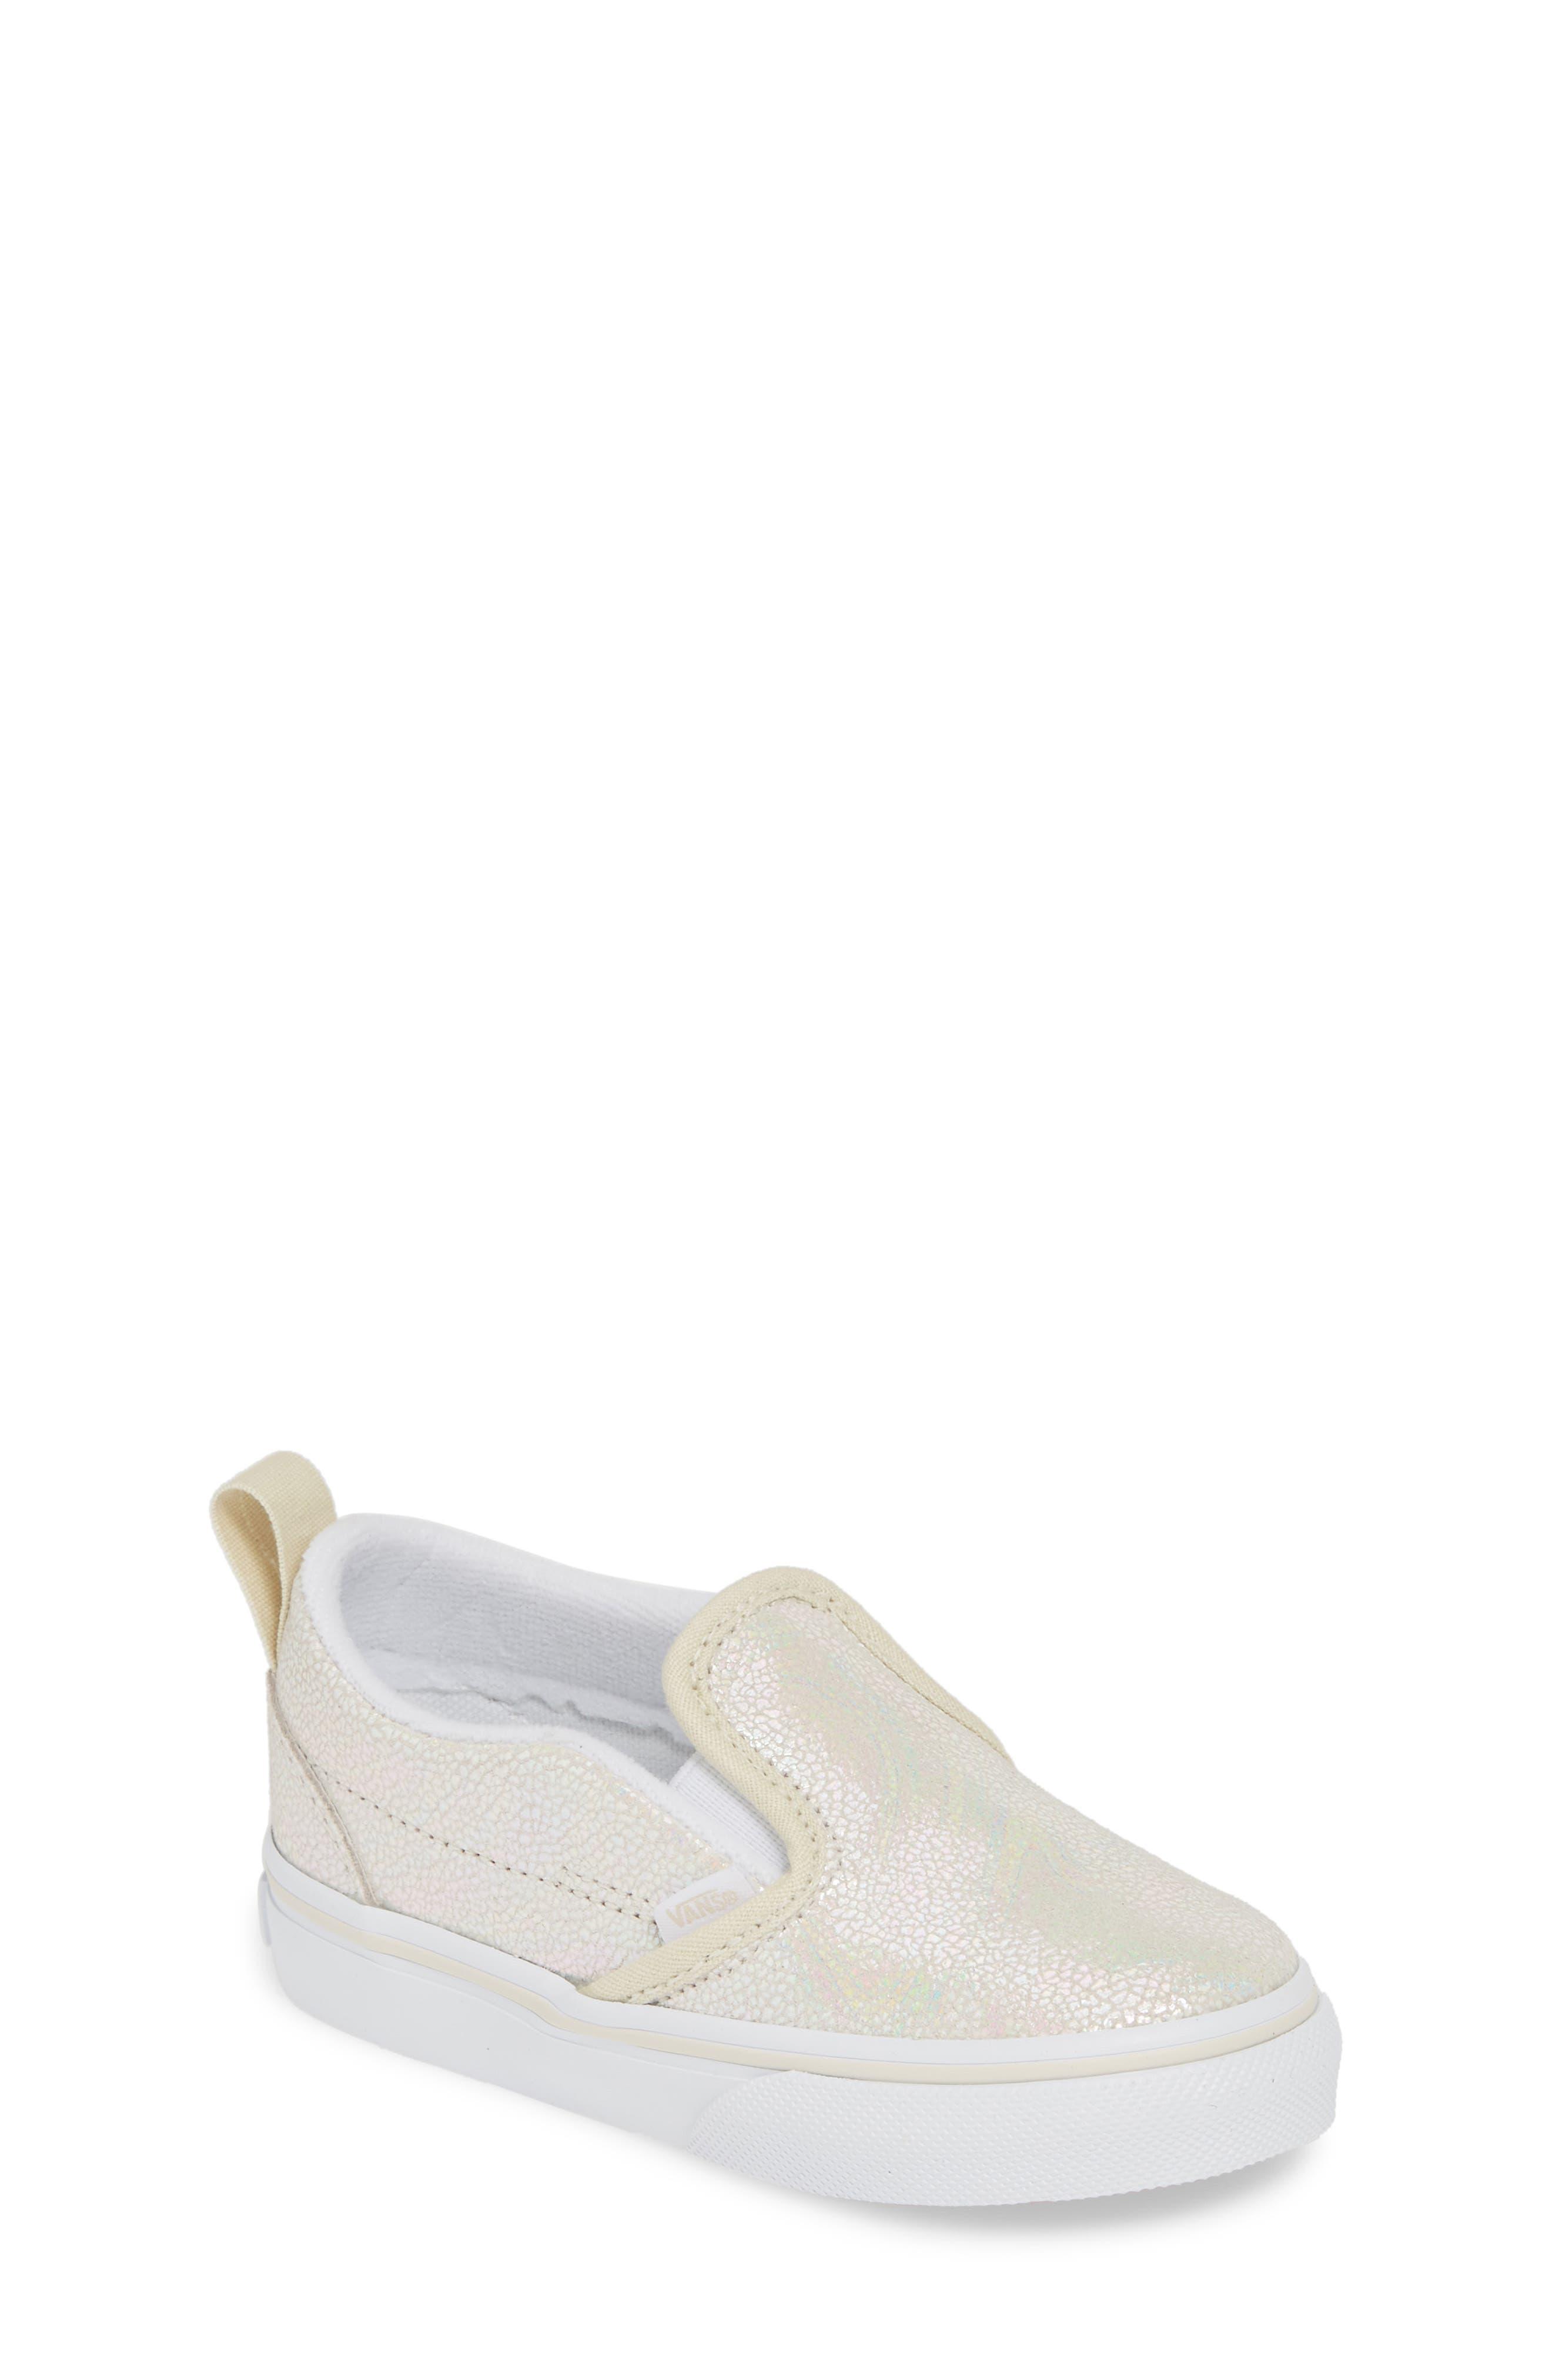 59bb701a3c Girls  Shoes  Sale